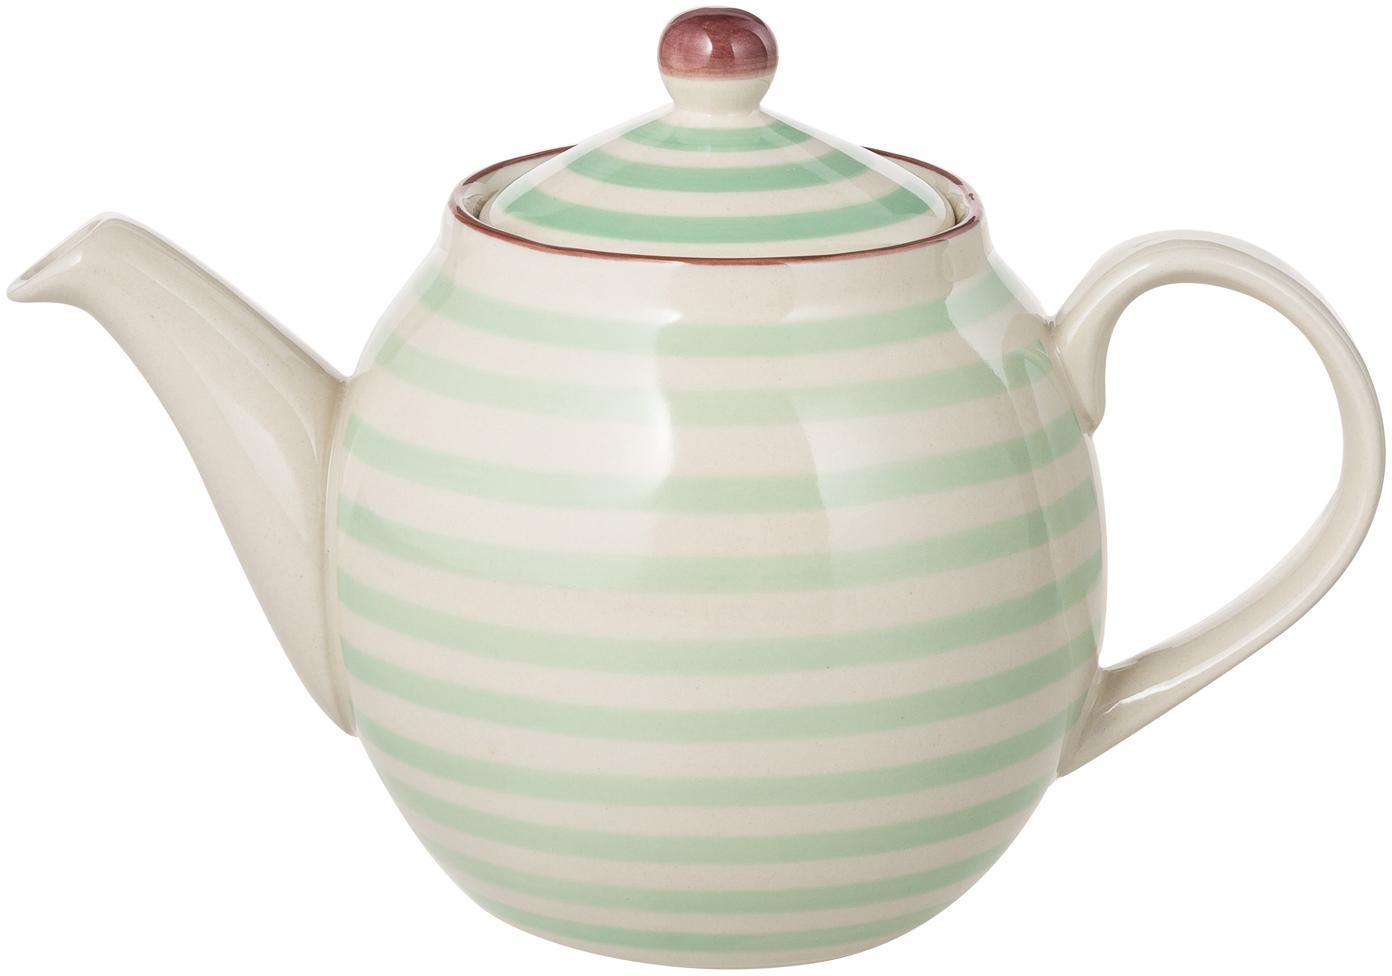 Theepot Patrizia, Keramiek, Buitenzijde: groen, crèmekleurig, paars. Binnenzijde: crèmekleurig, 1.2 L